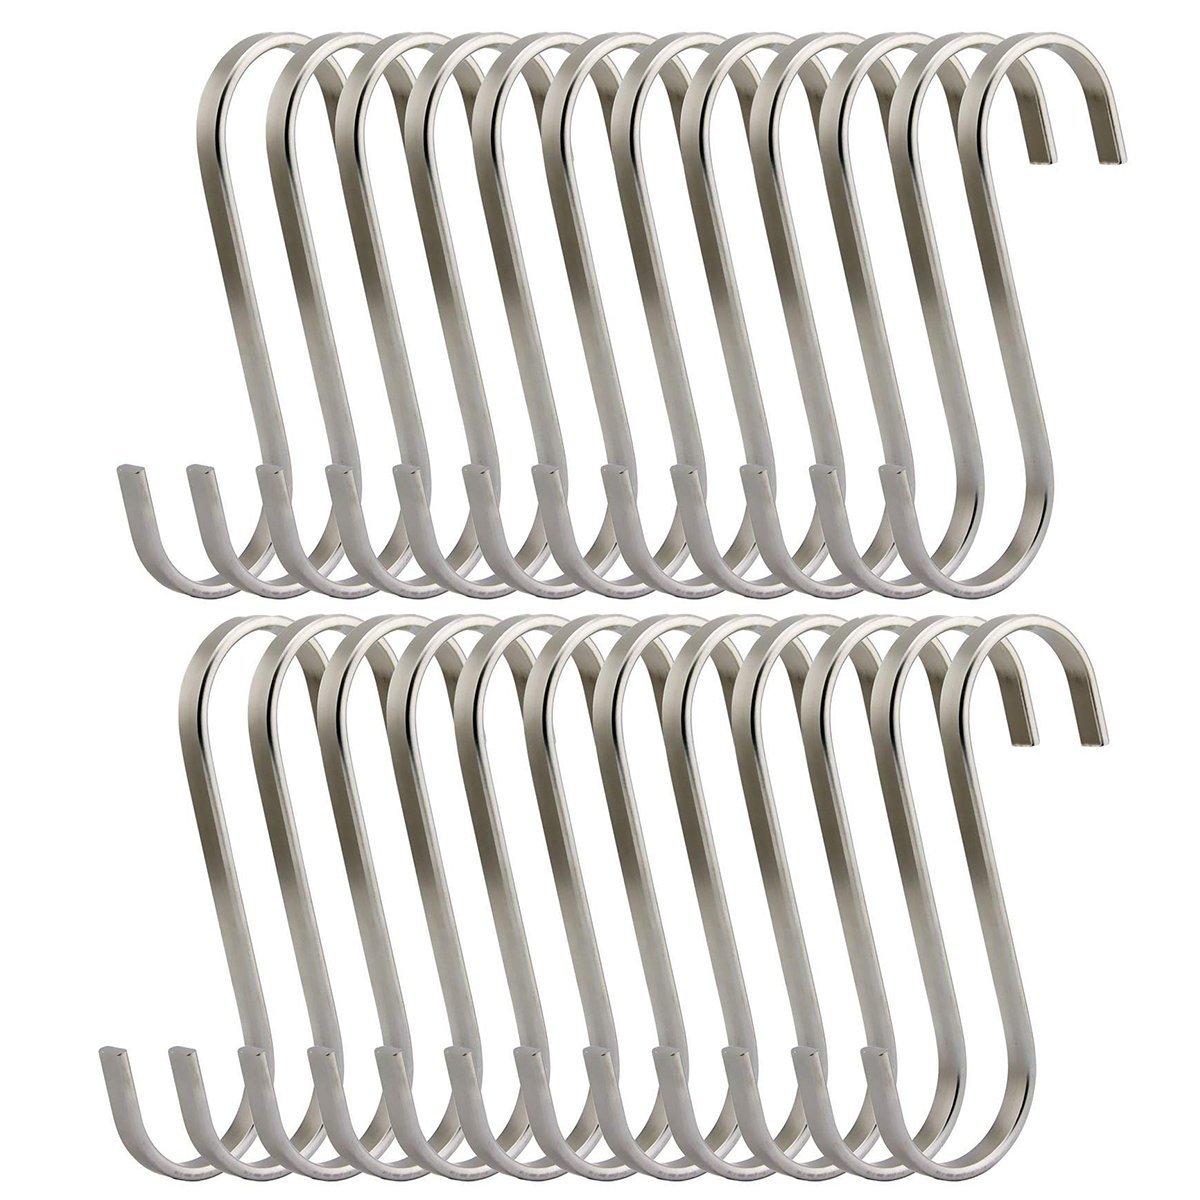 25 Pack 3 inch Flat S Hooks Heavy Duty Solid 304 Stainless Steel S Shaped Hanging Hooks,Metal Kitchen Pot Pan Hangers Rack Hooks